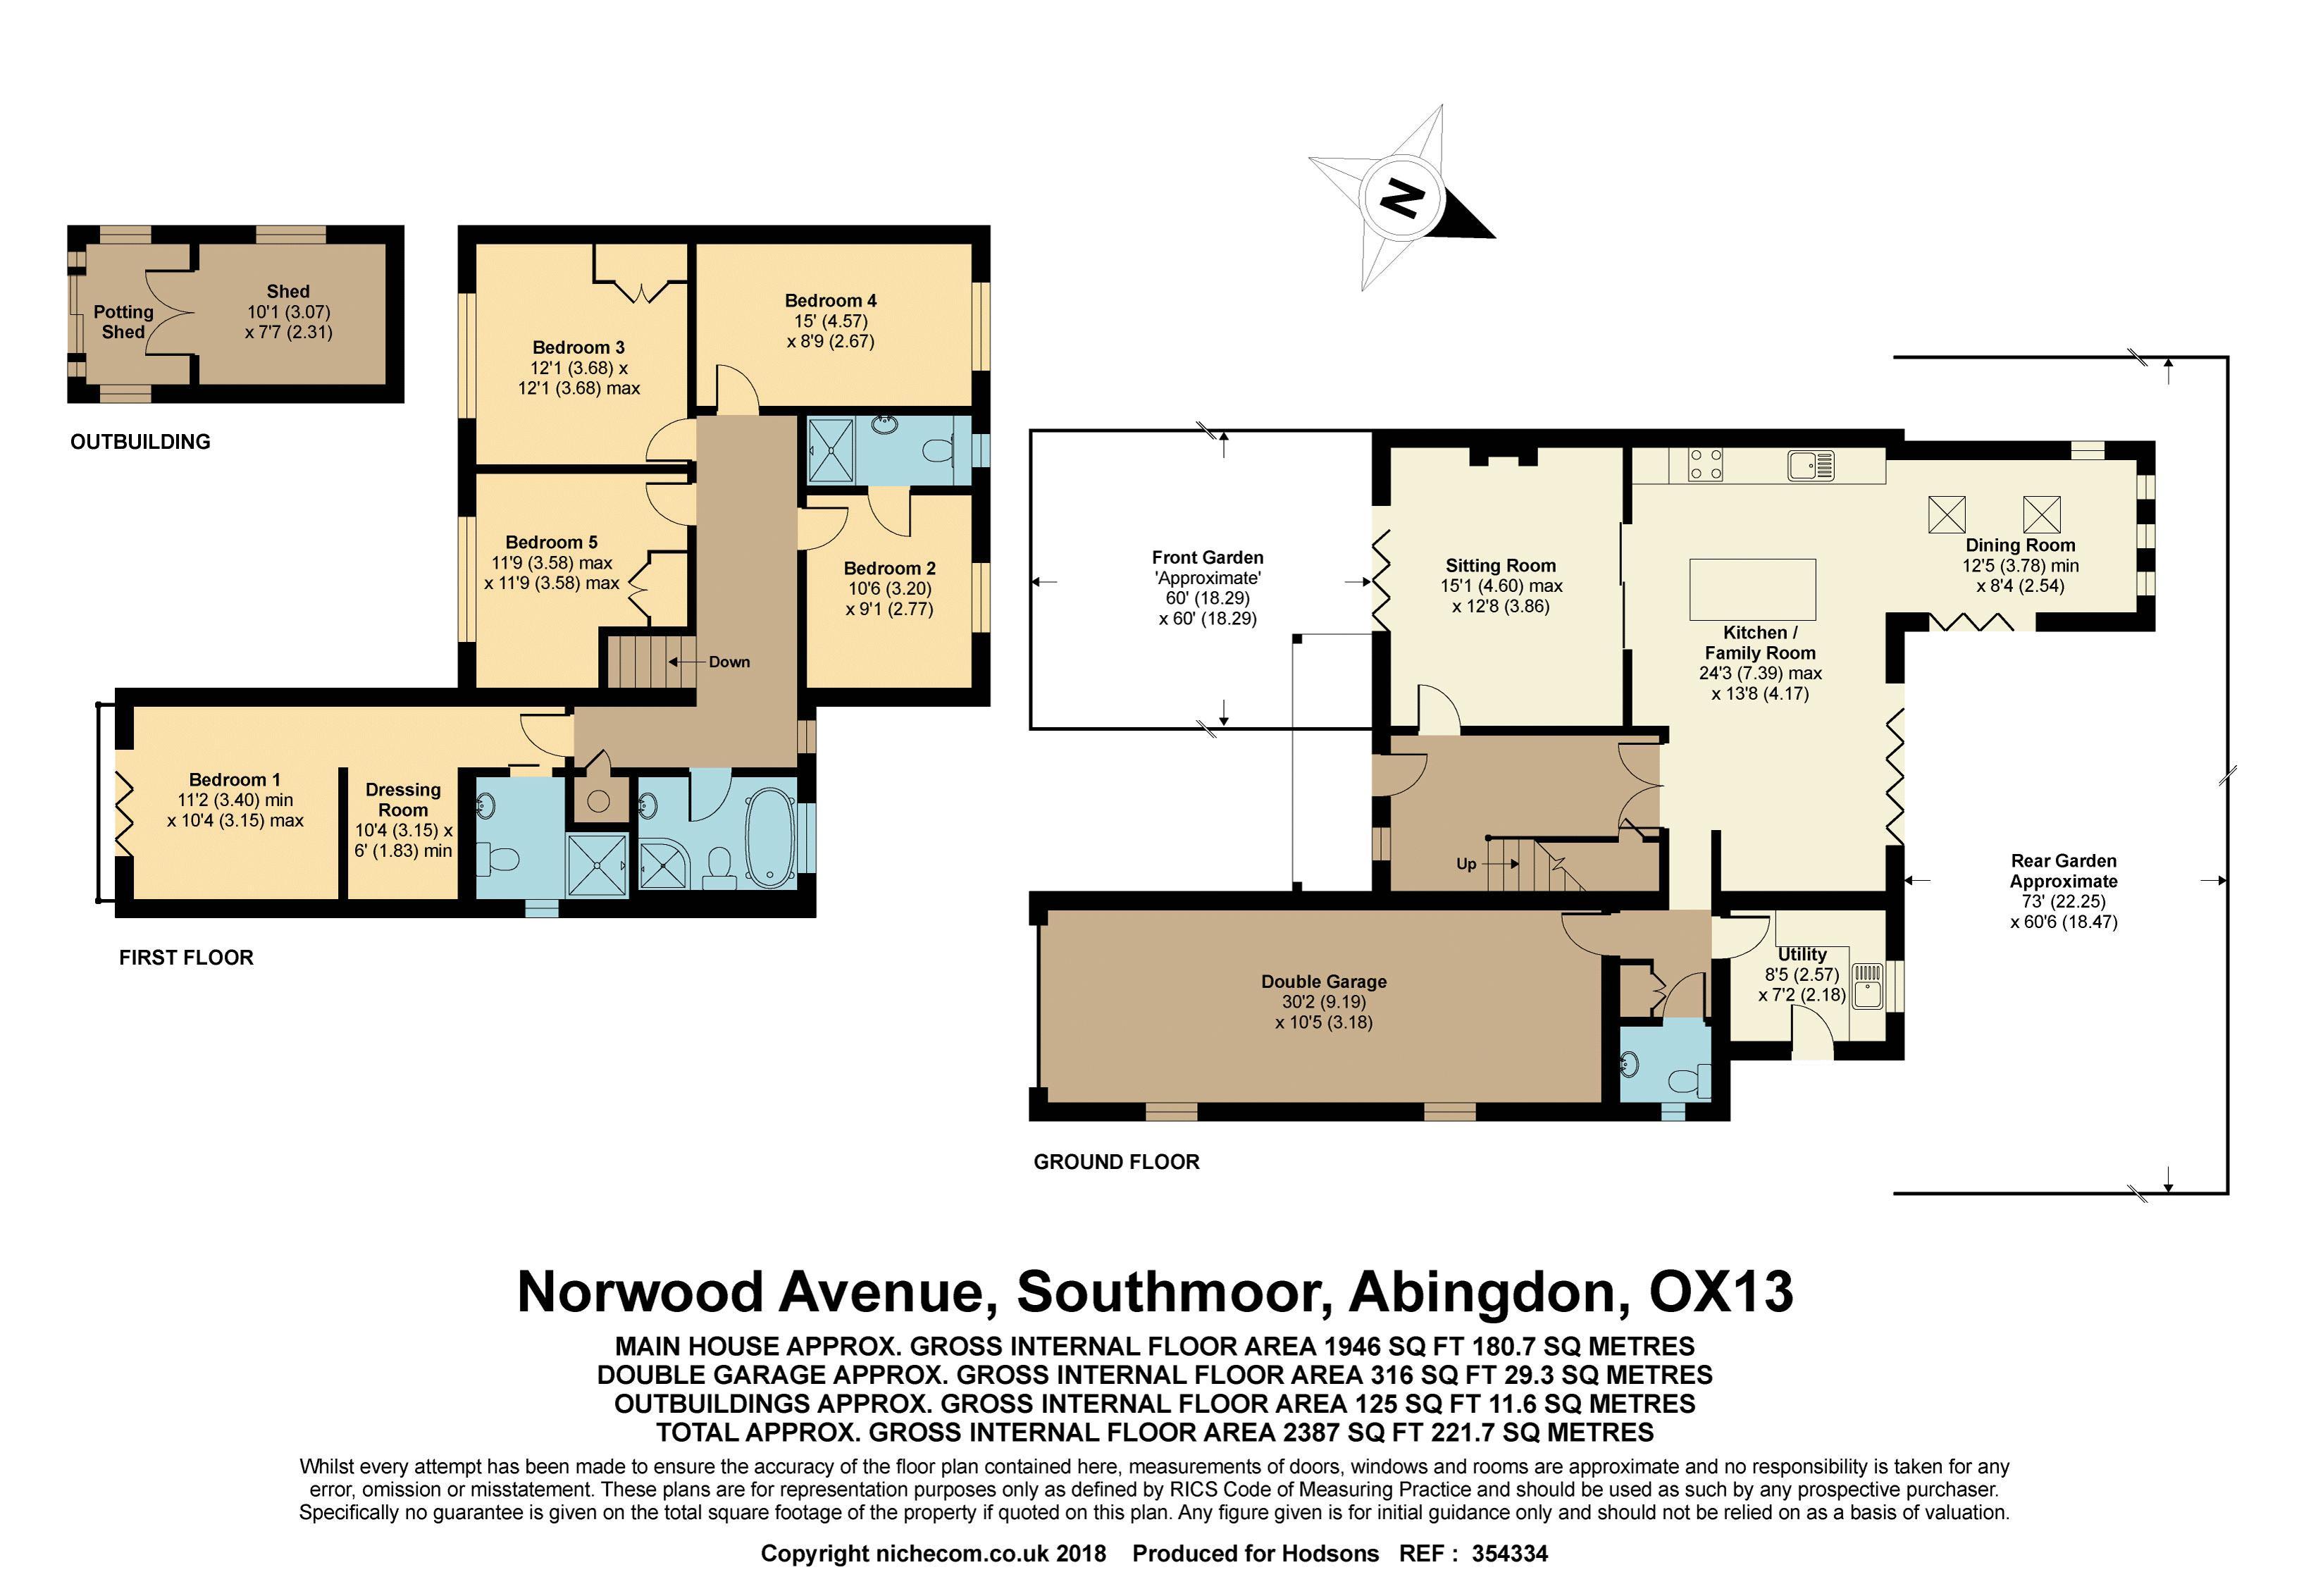 14 Norwood Avenue Southmoor